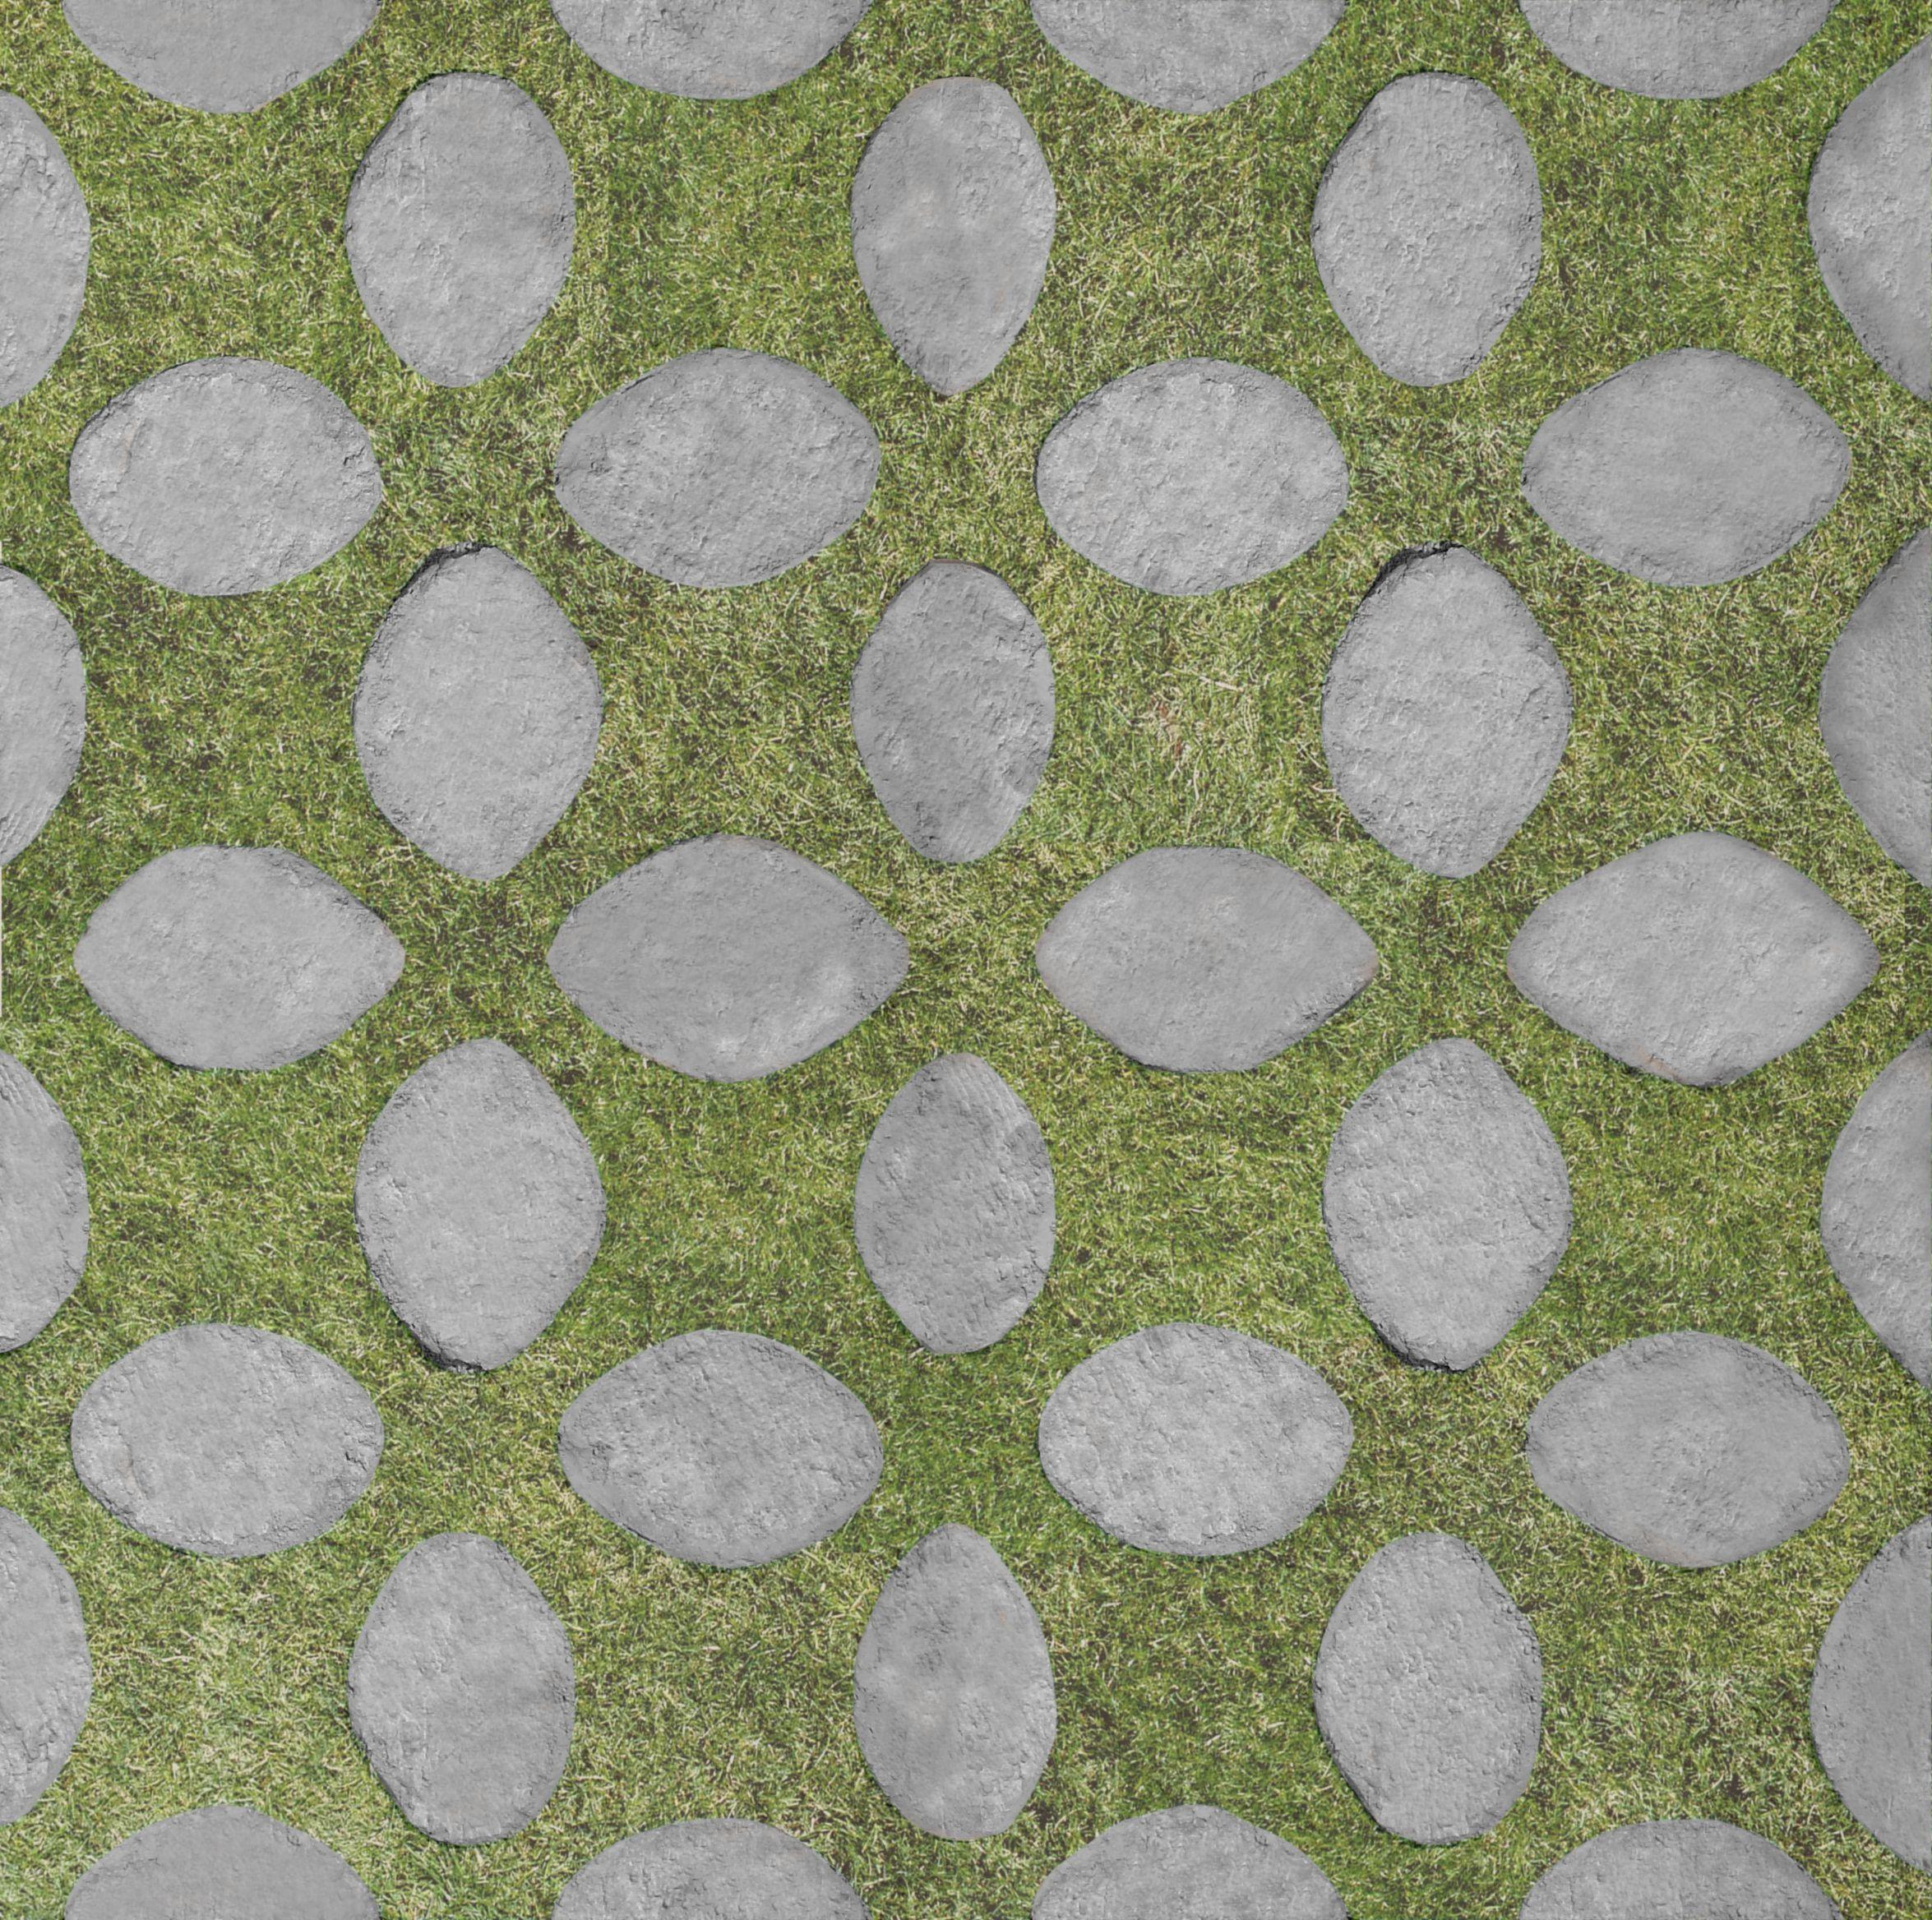 Grasscrete Paving Texture Wood Floor Texture Tiles Texture